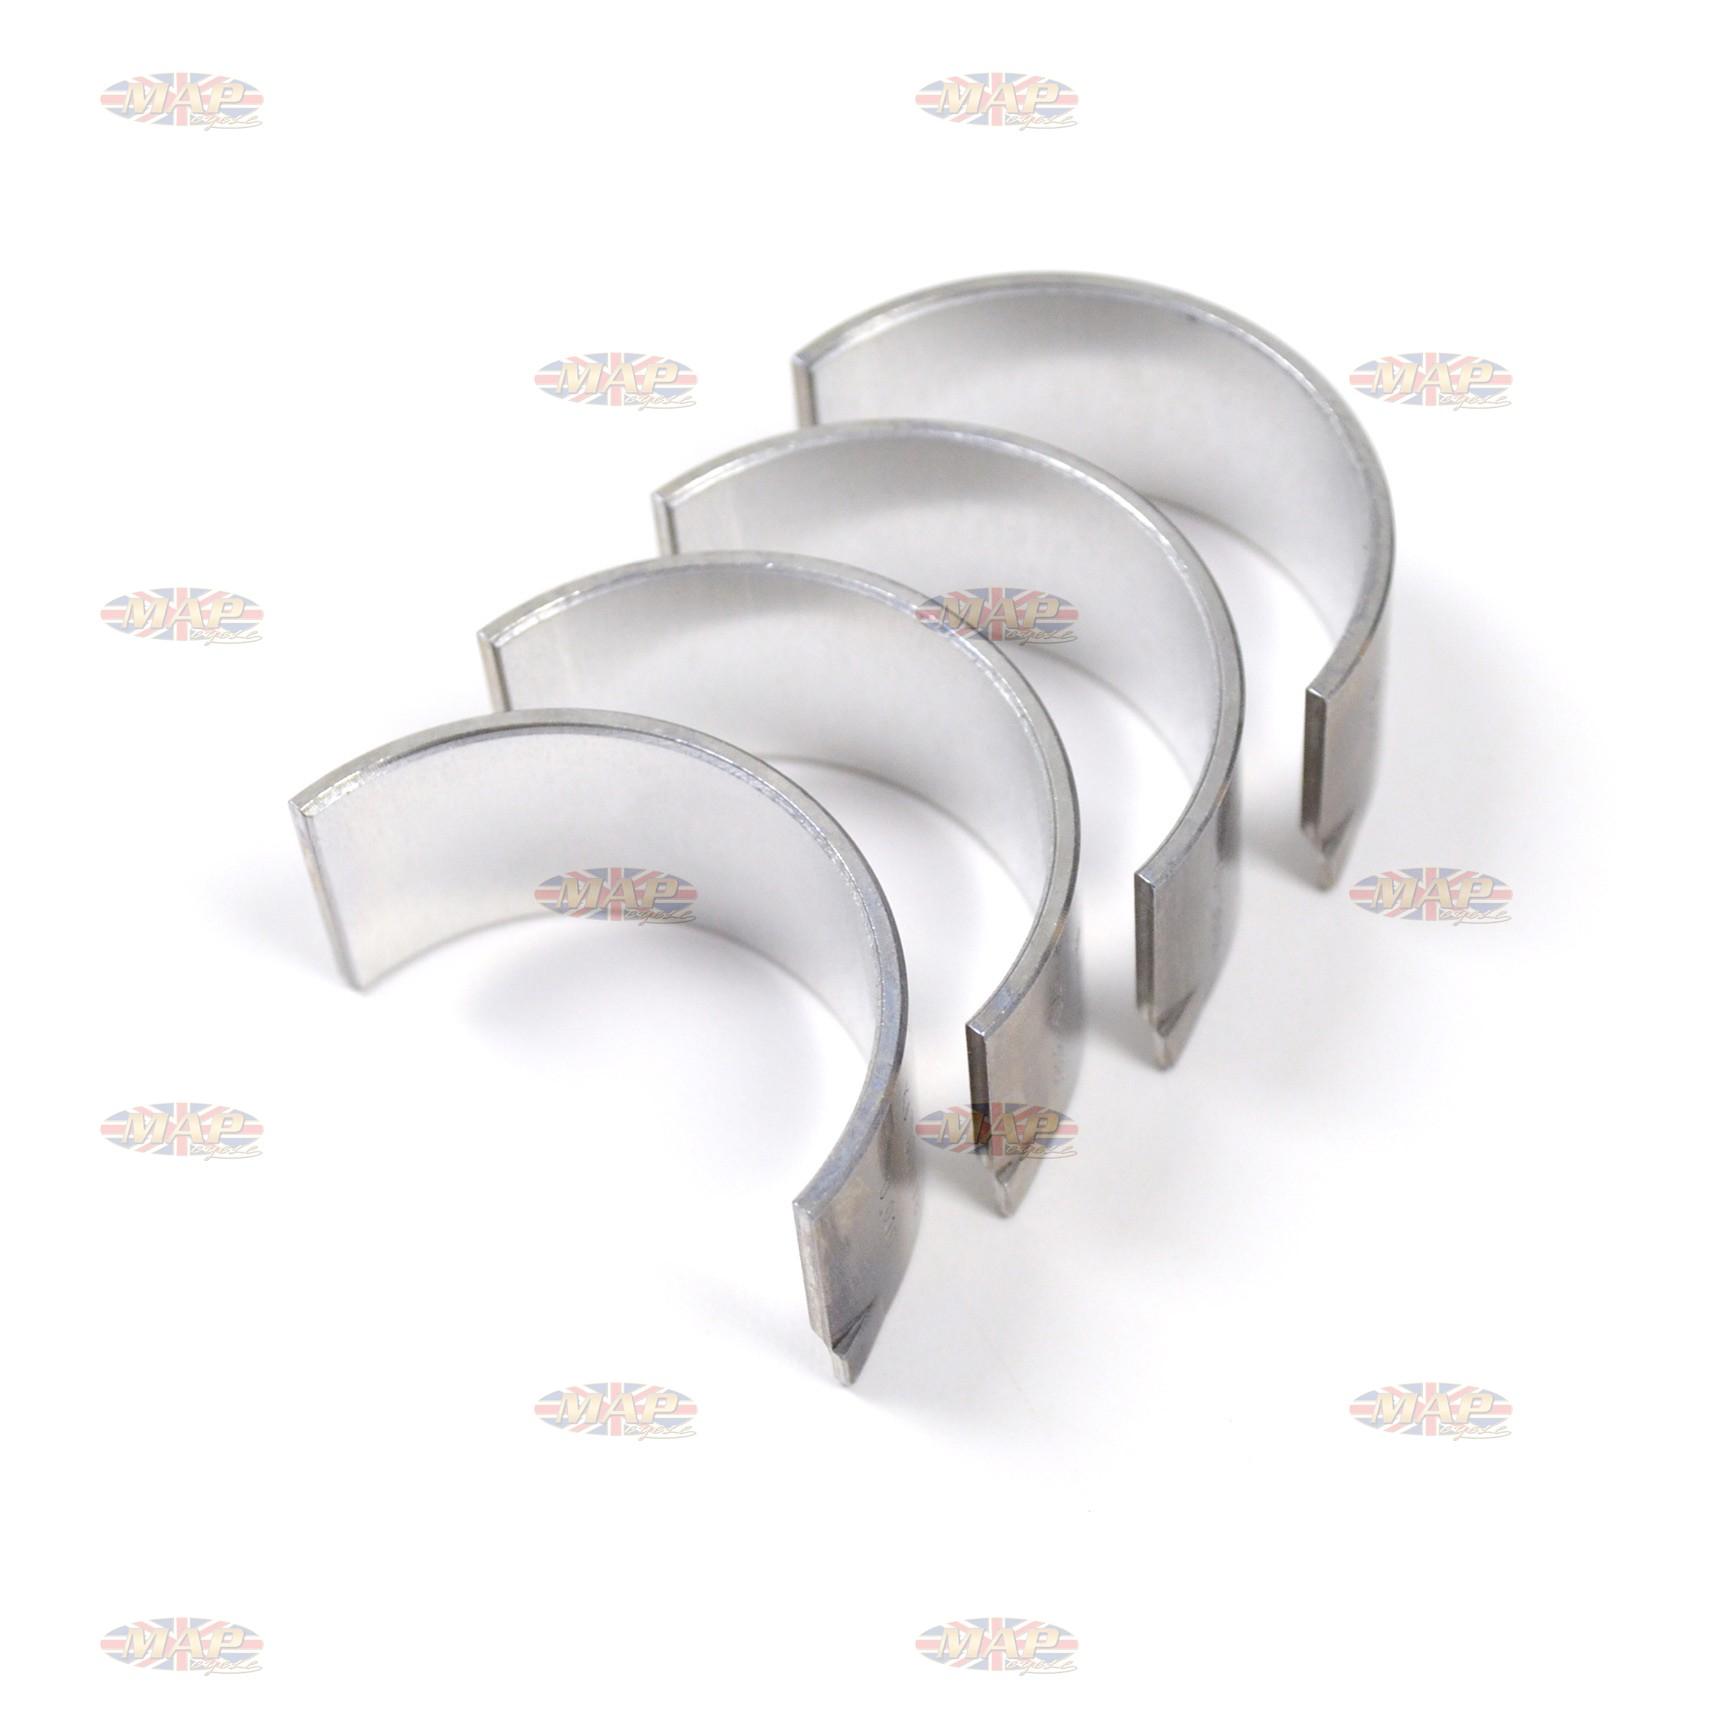 ROD BEARING/ TRI 650-750 II 030 B2026M/E030